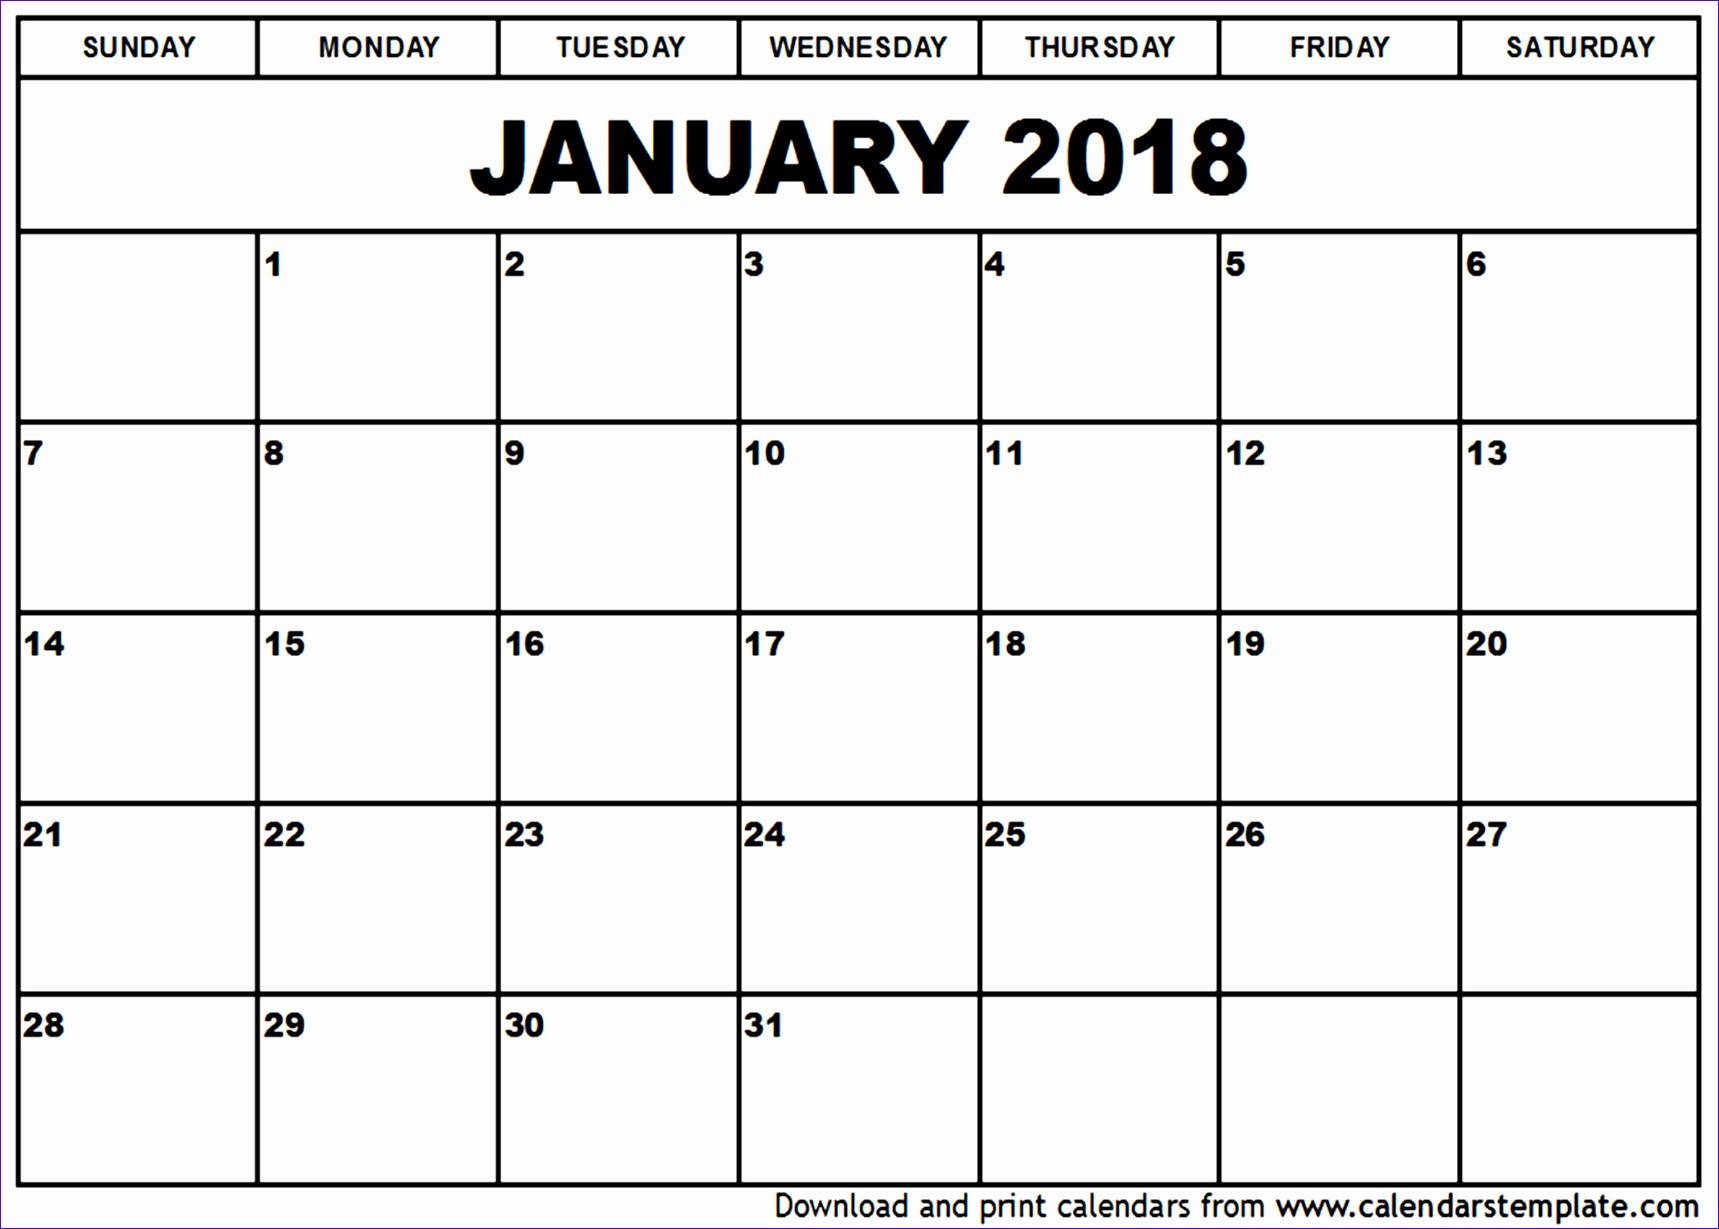 january 2018 1284 17191229